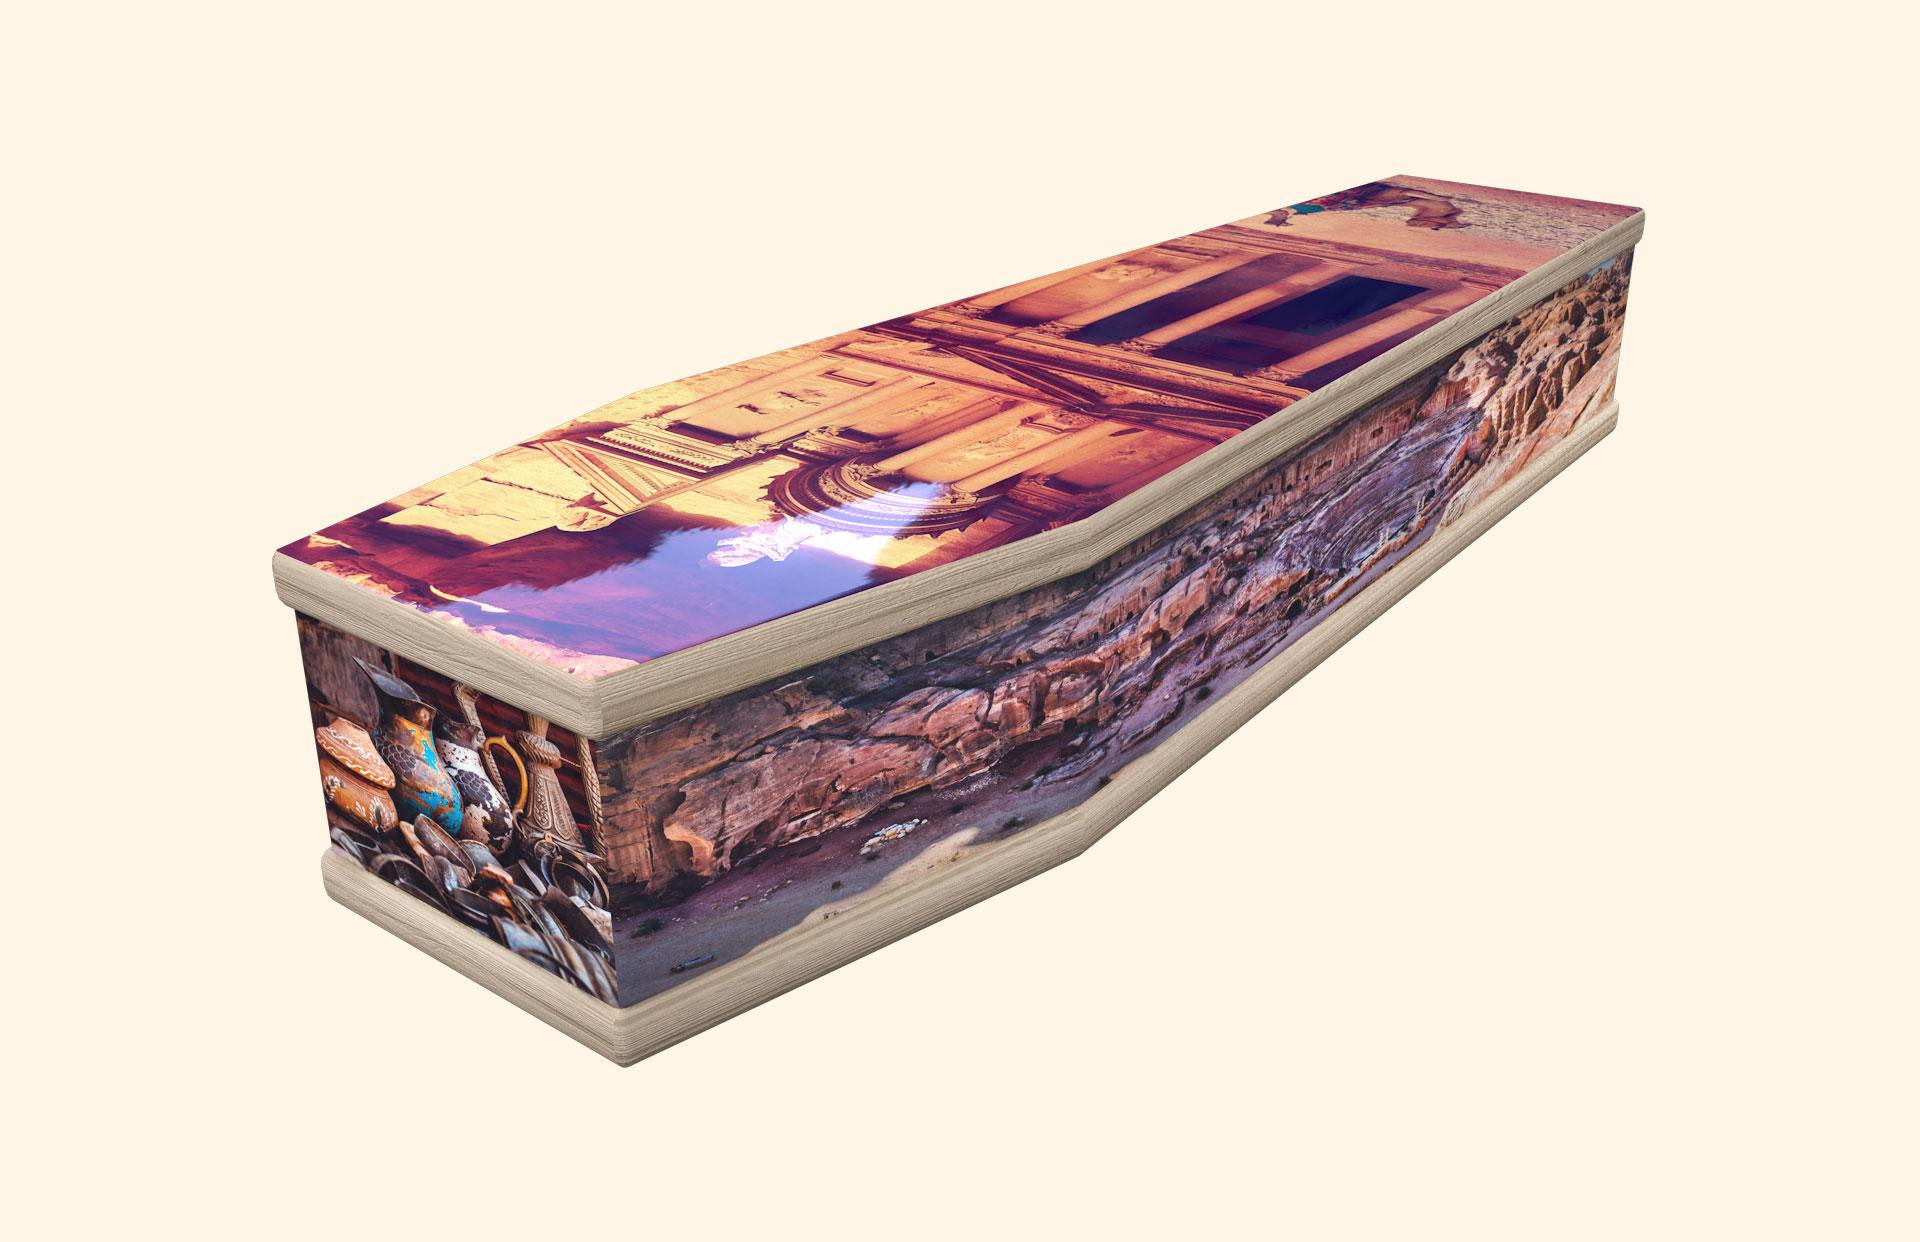 Petra the Lost City classic coffin